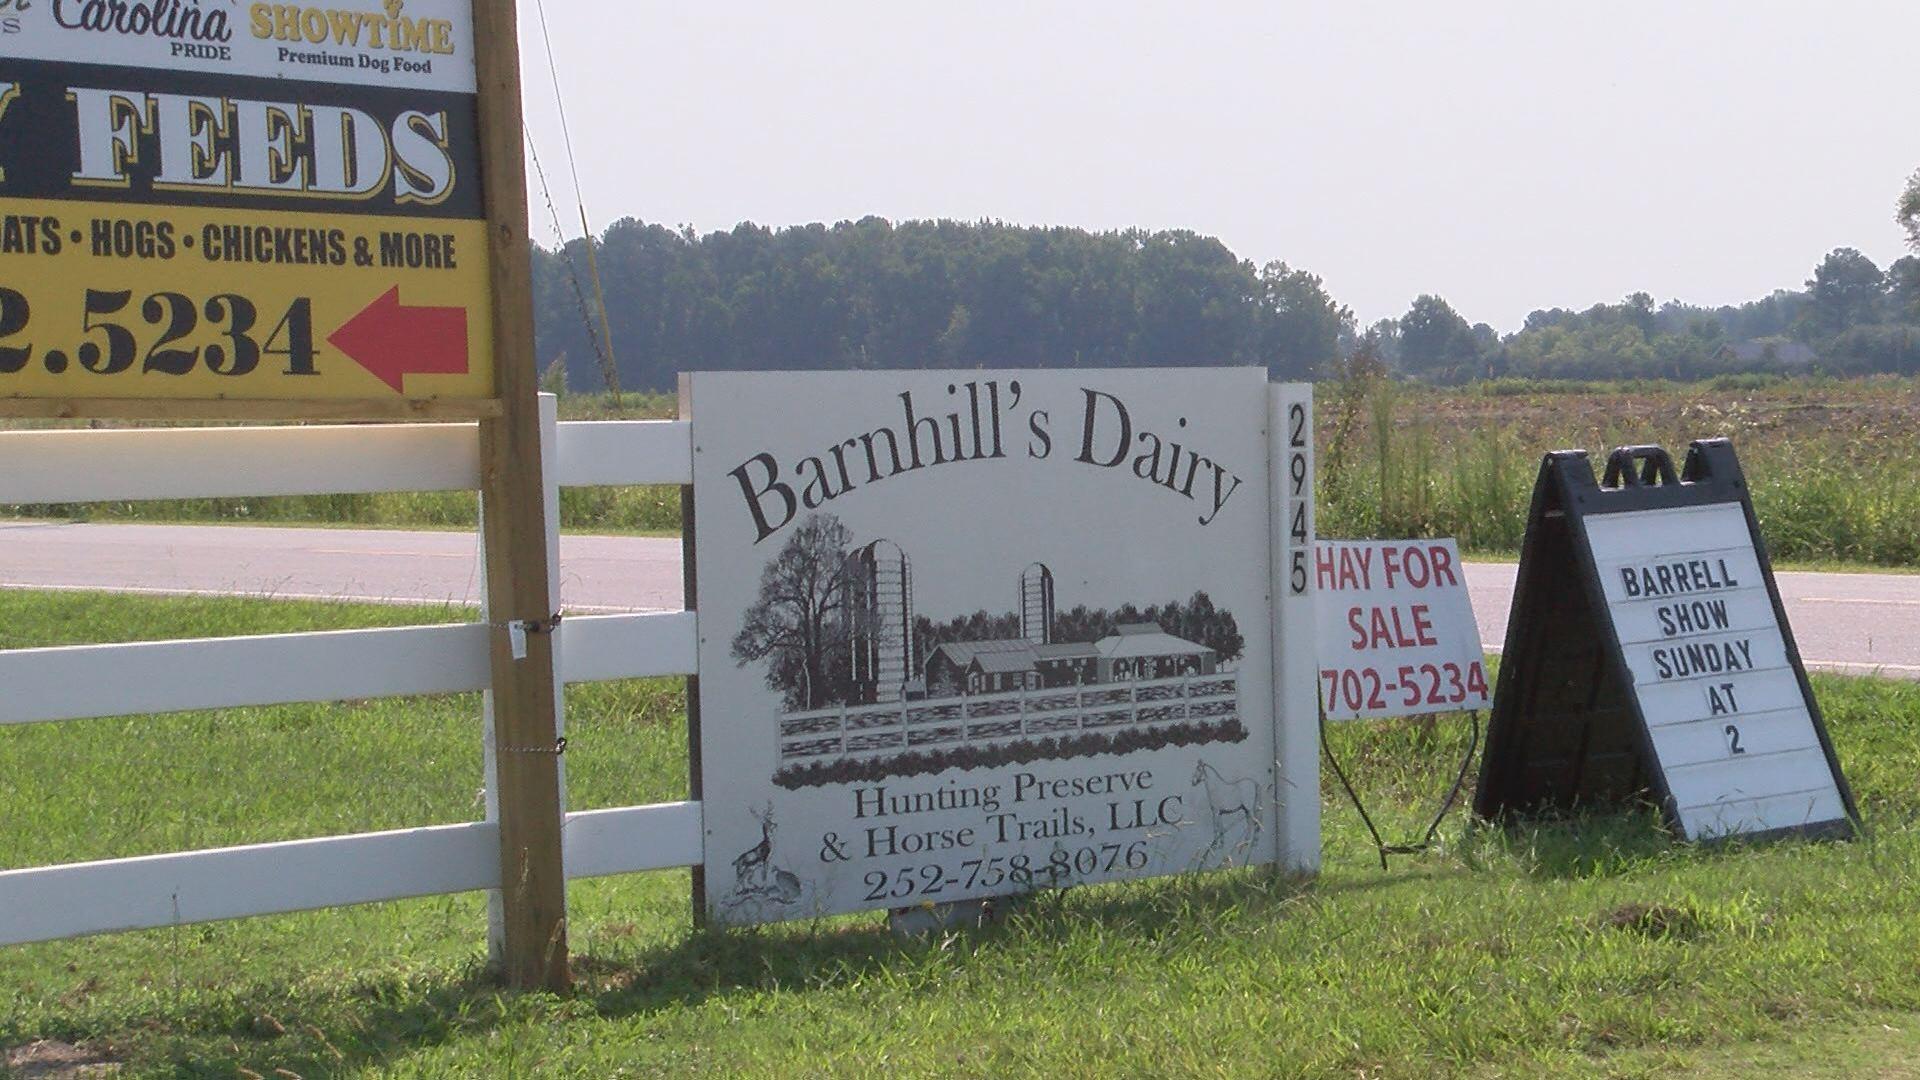 BARN HILL DAIRY_475306